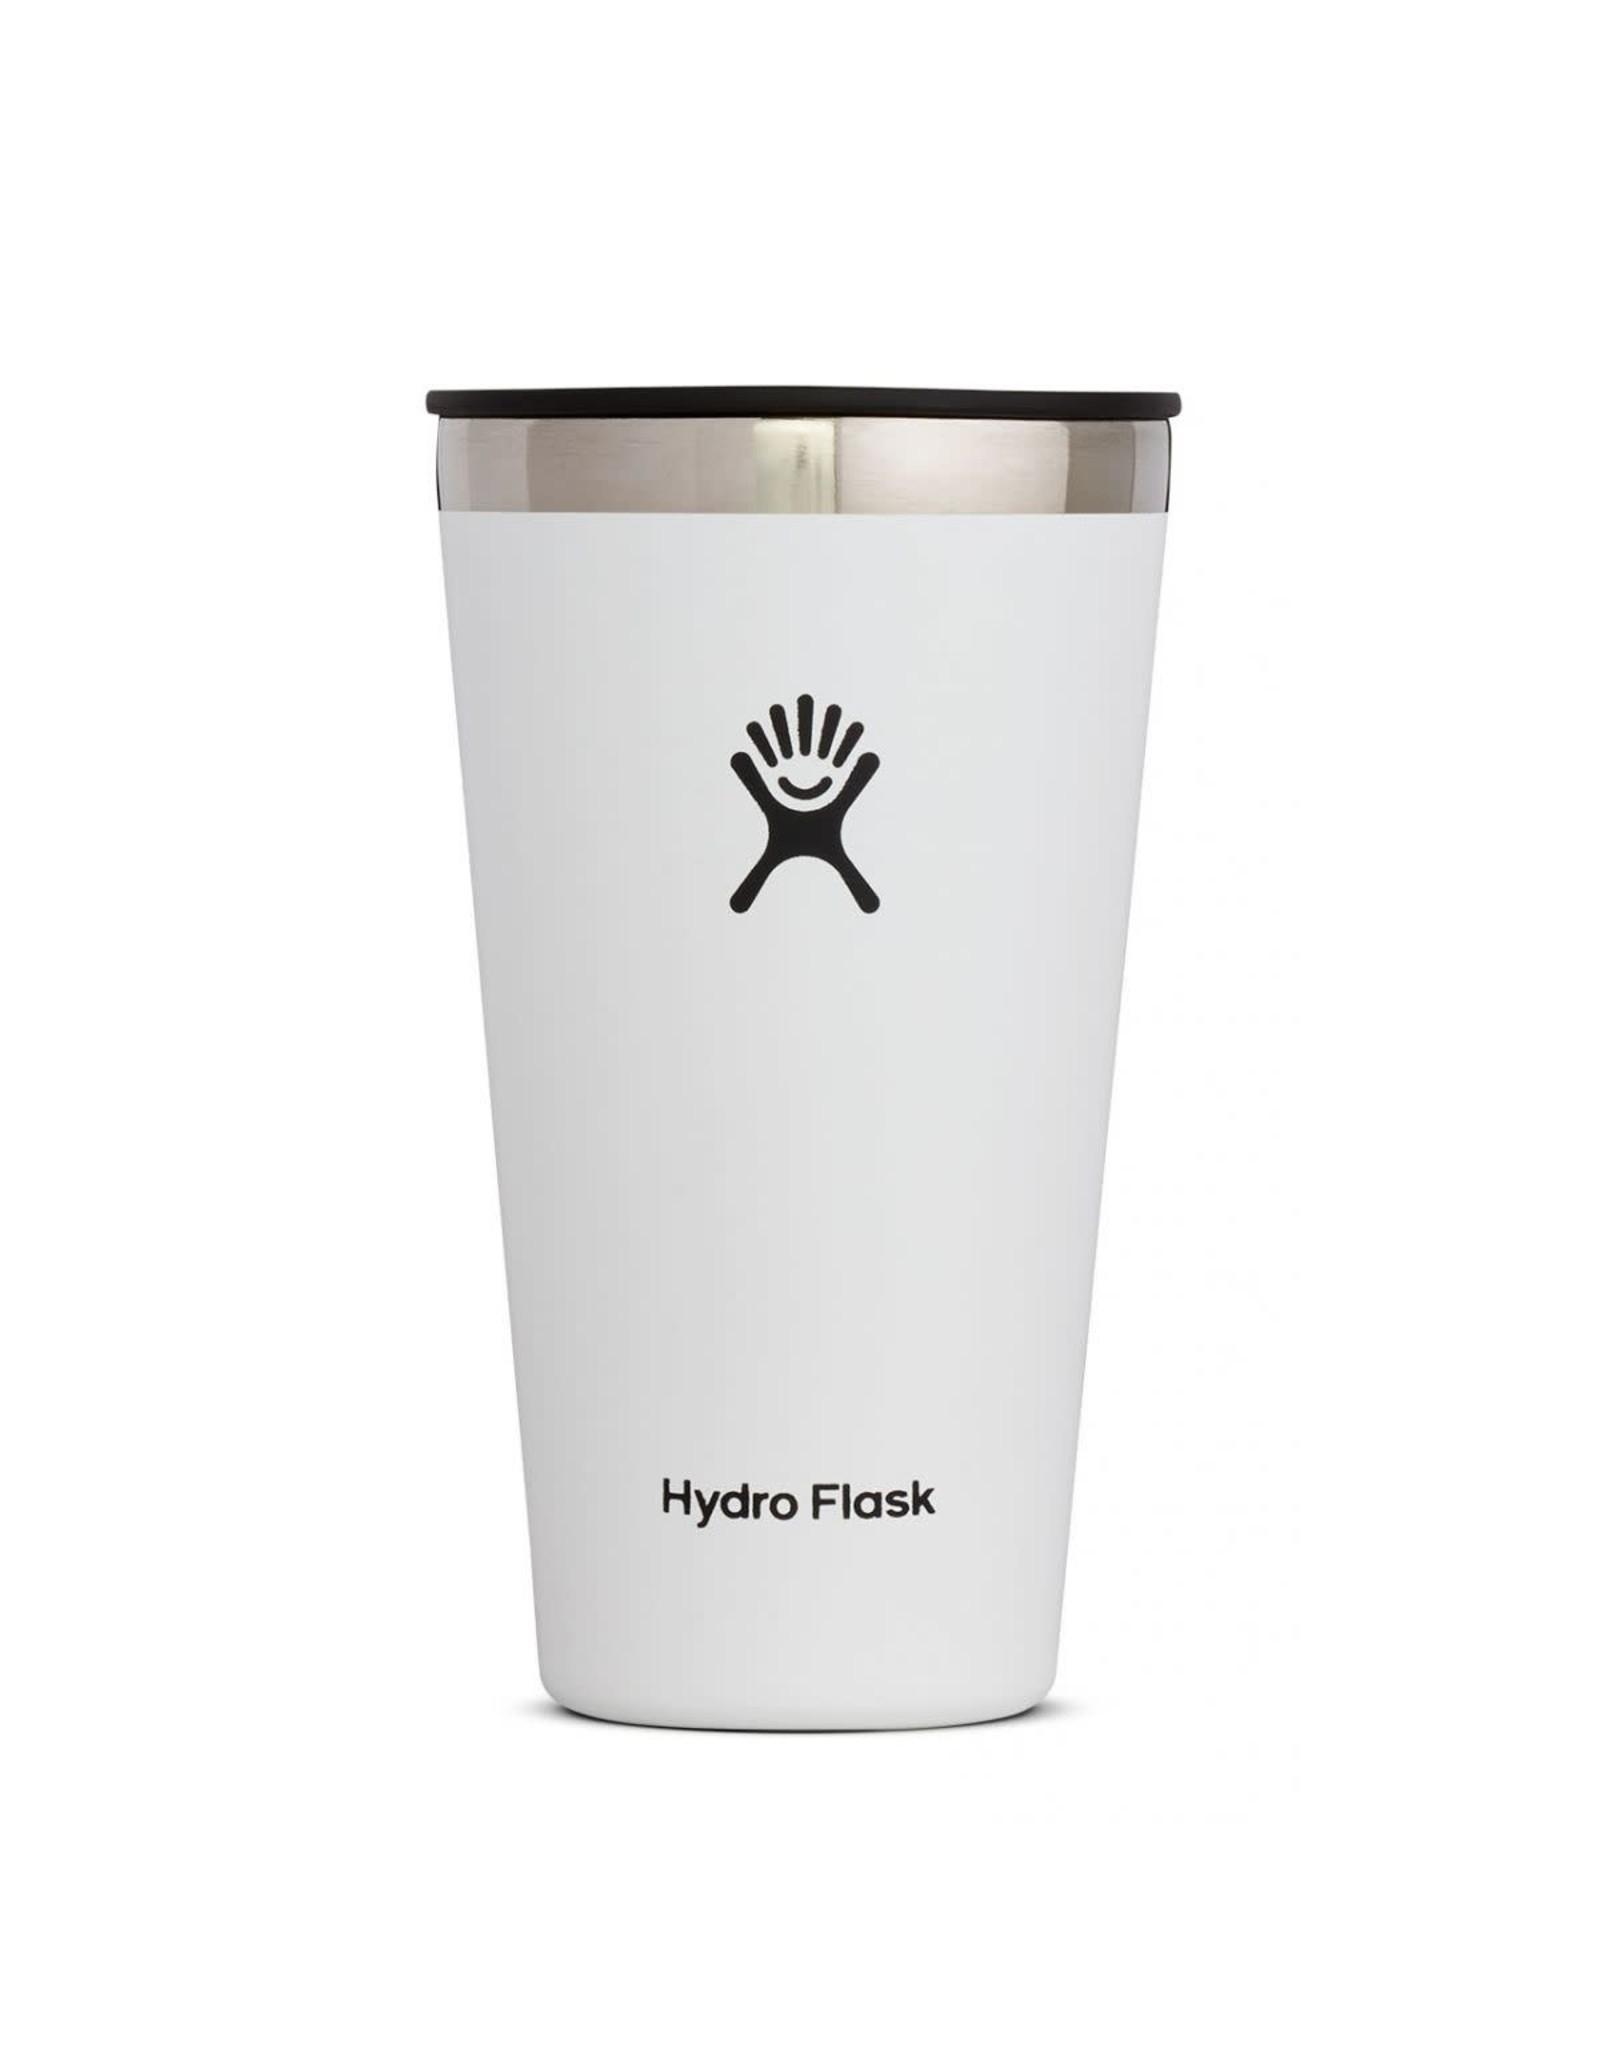 Hydro Flask Hydro Flask 16oz Tumbler White